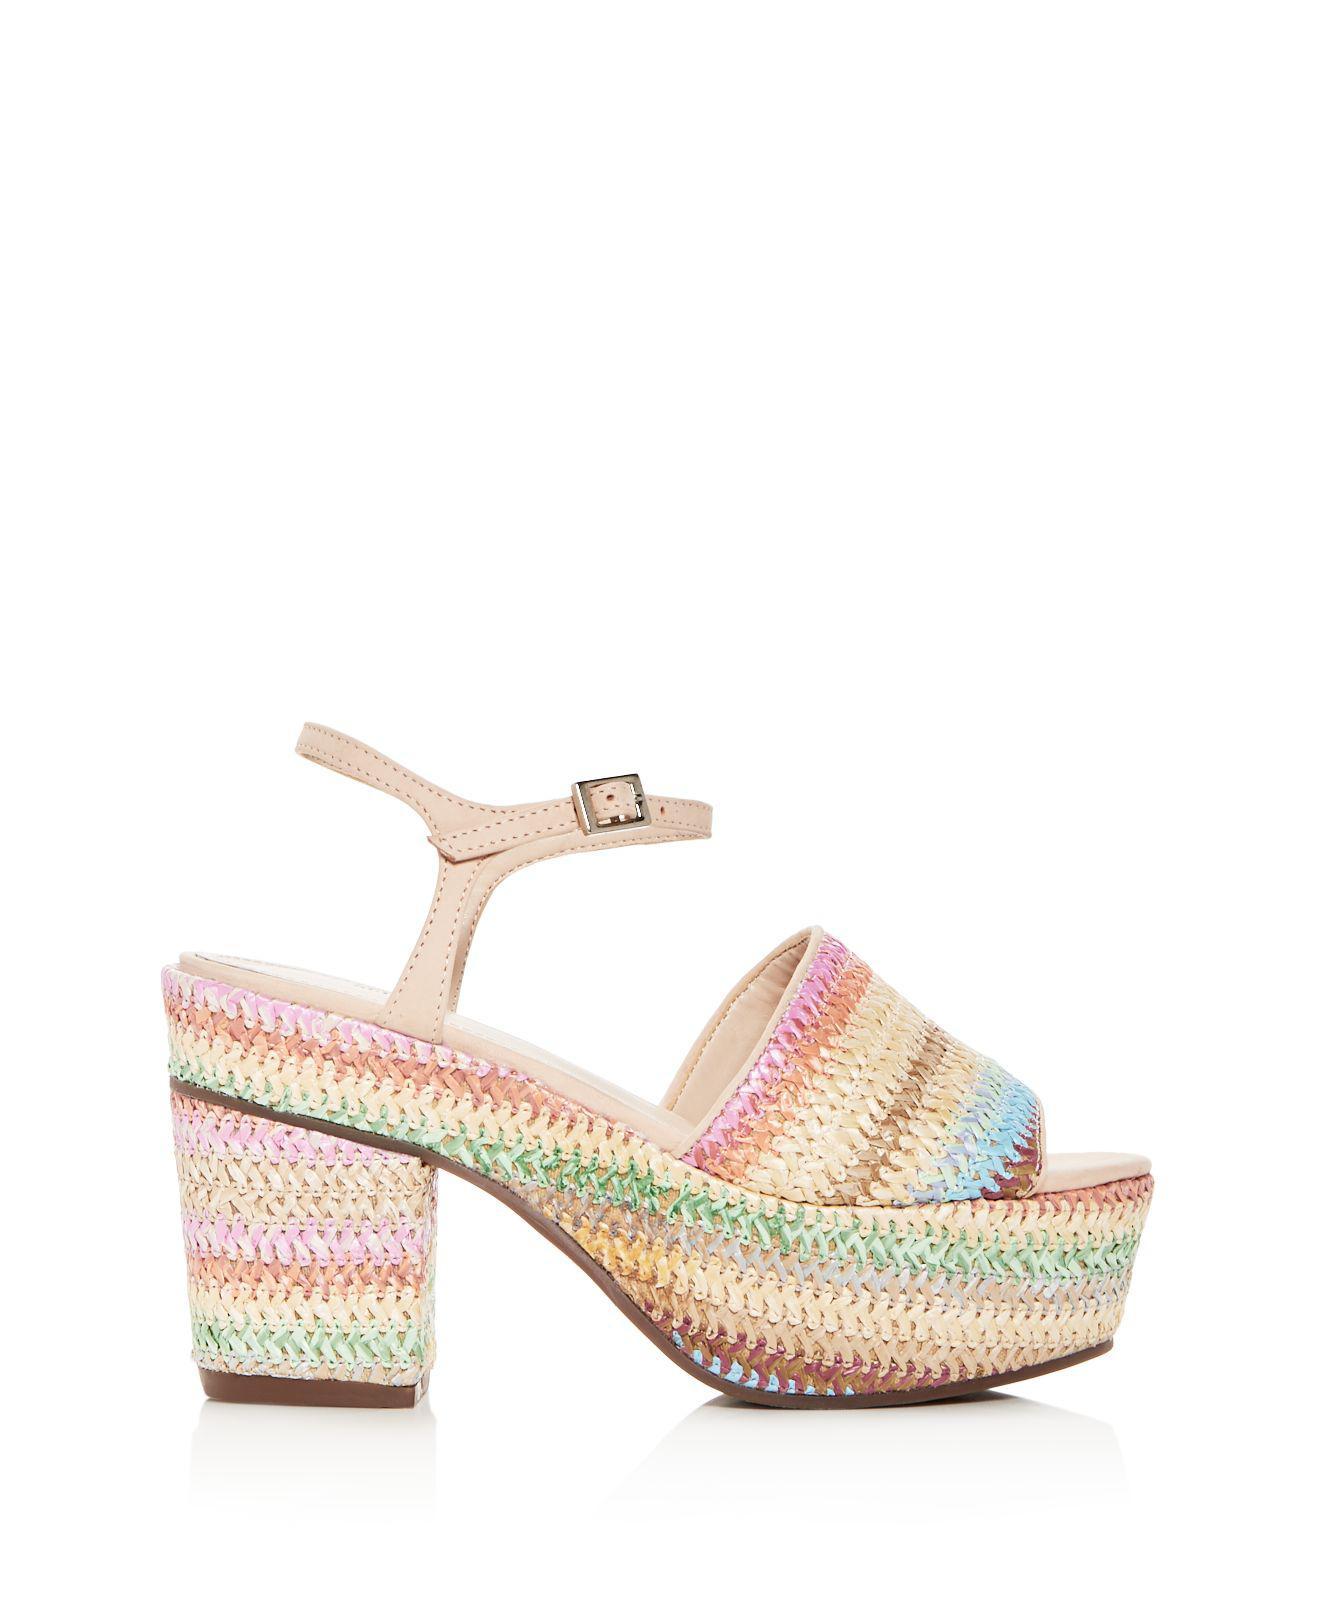 Schutz Women's Ziquiele Raffia Block Heel Platform Sandals uAtqzcV